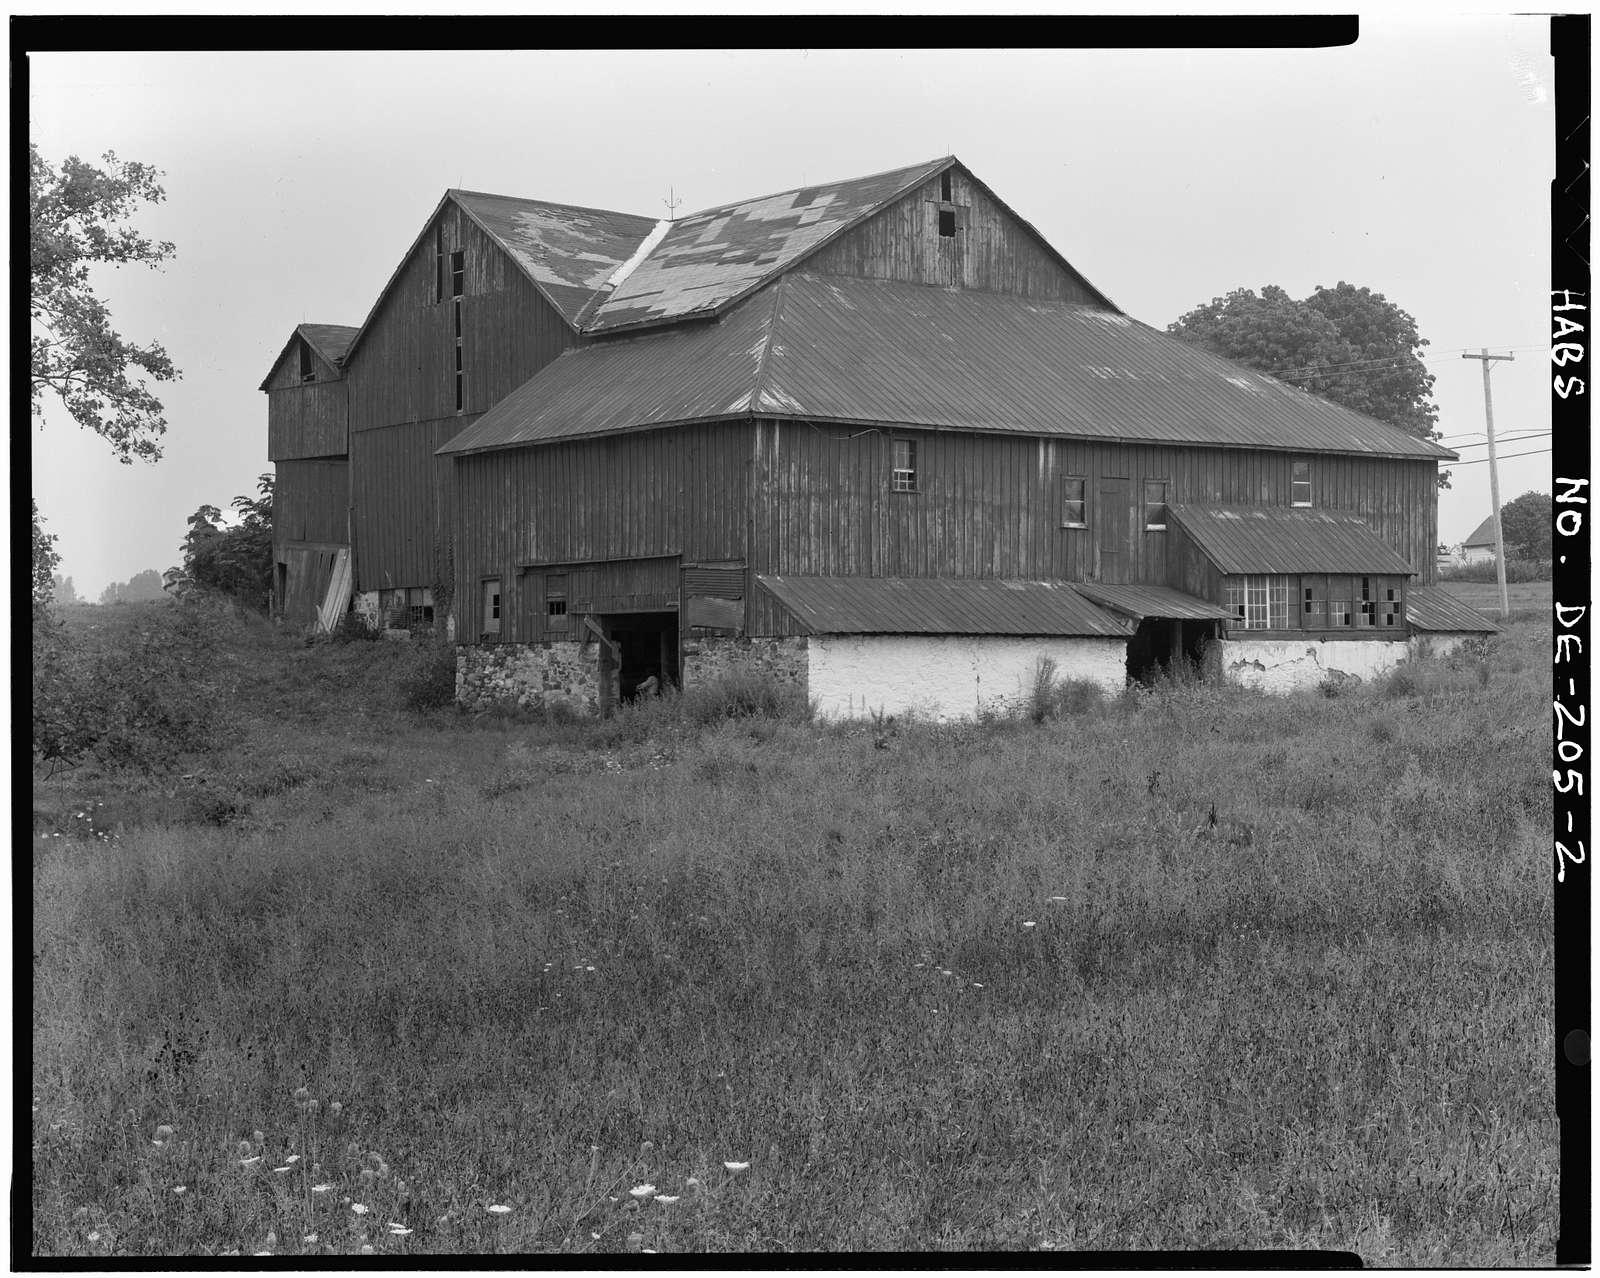 Corner Ketch Barn, Route 290, Corner Ketch, New Castle County, DE